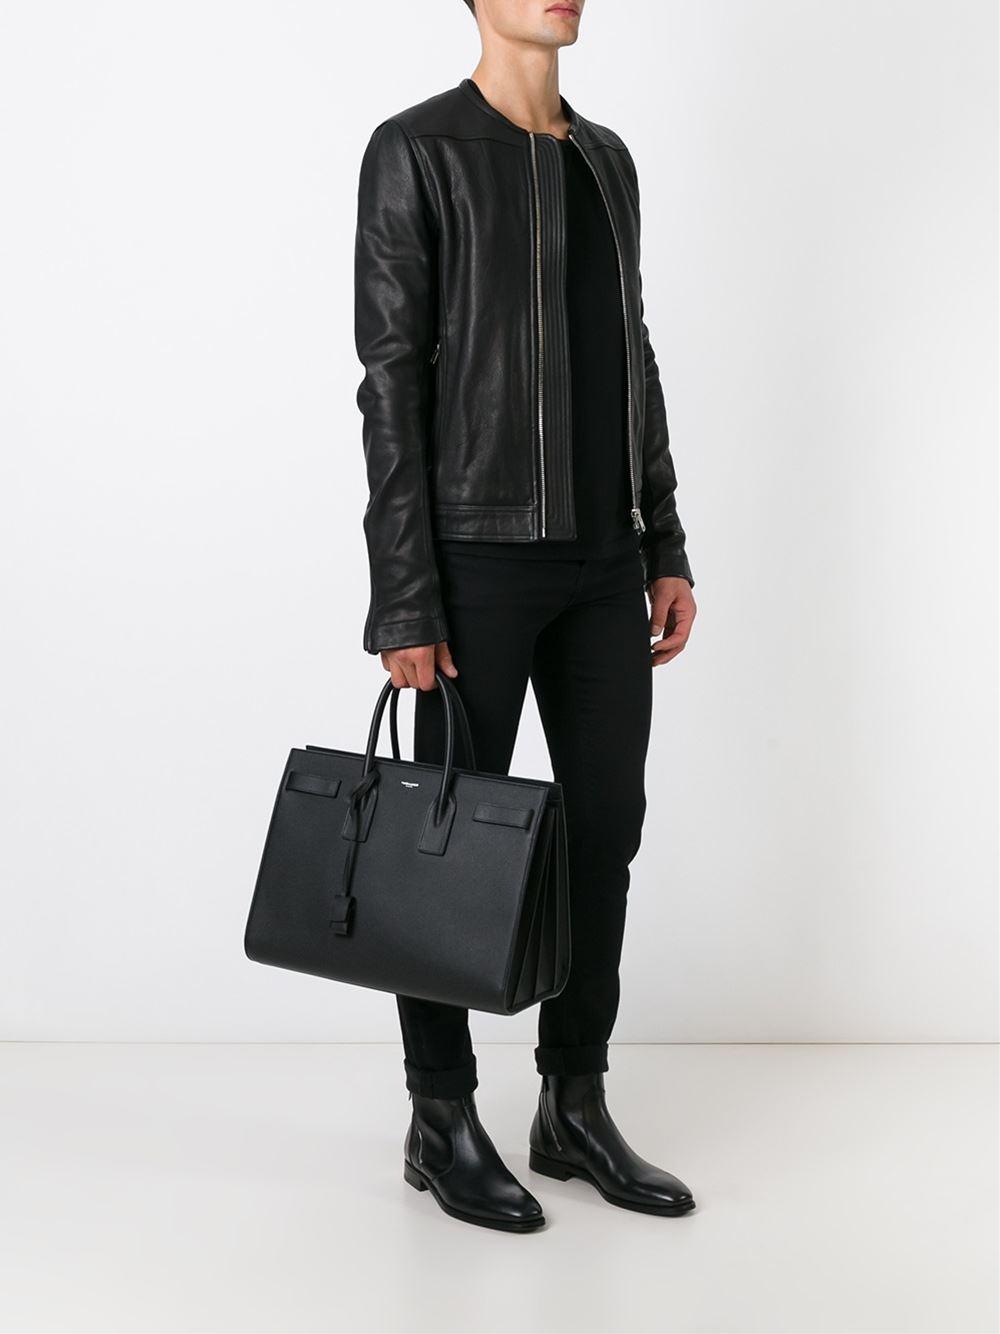 saint laurent bag men  ysl replica handbag